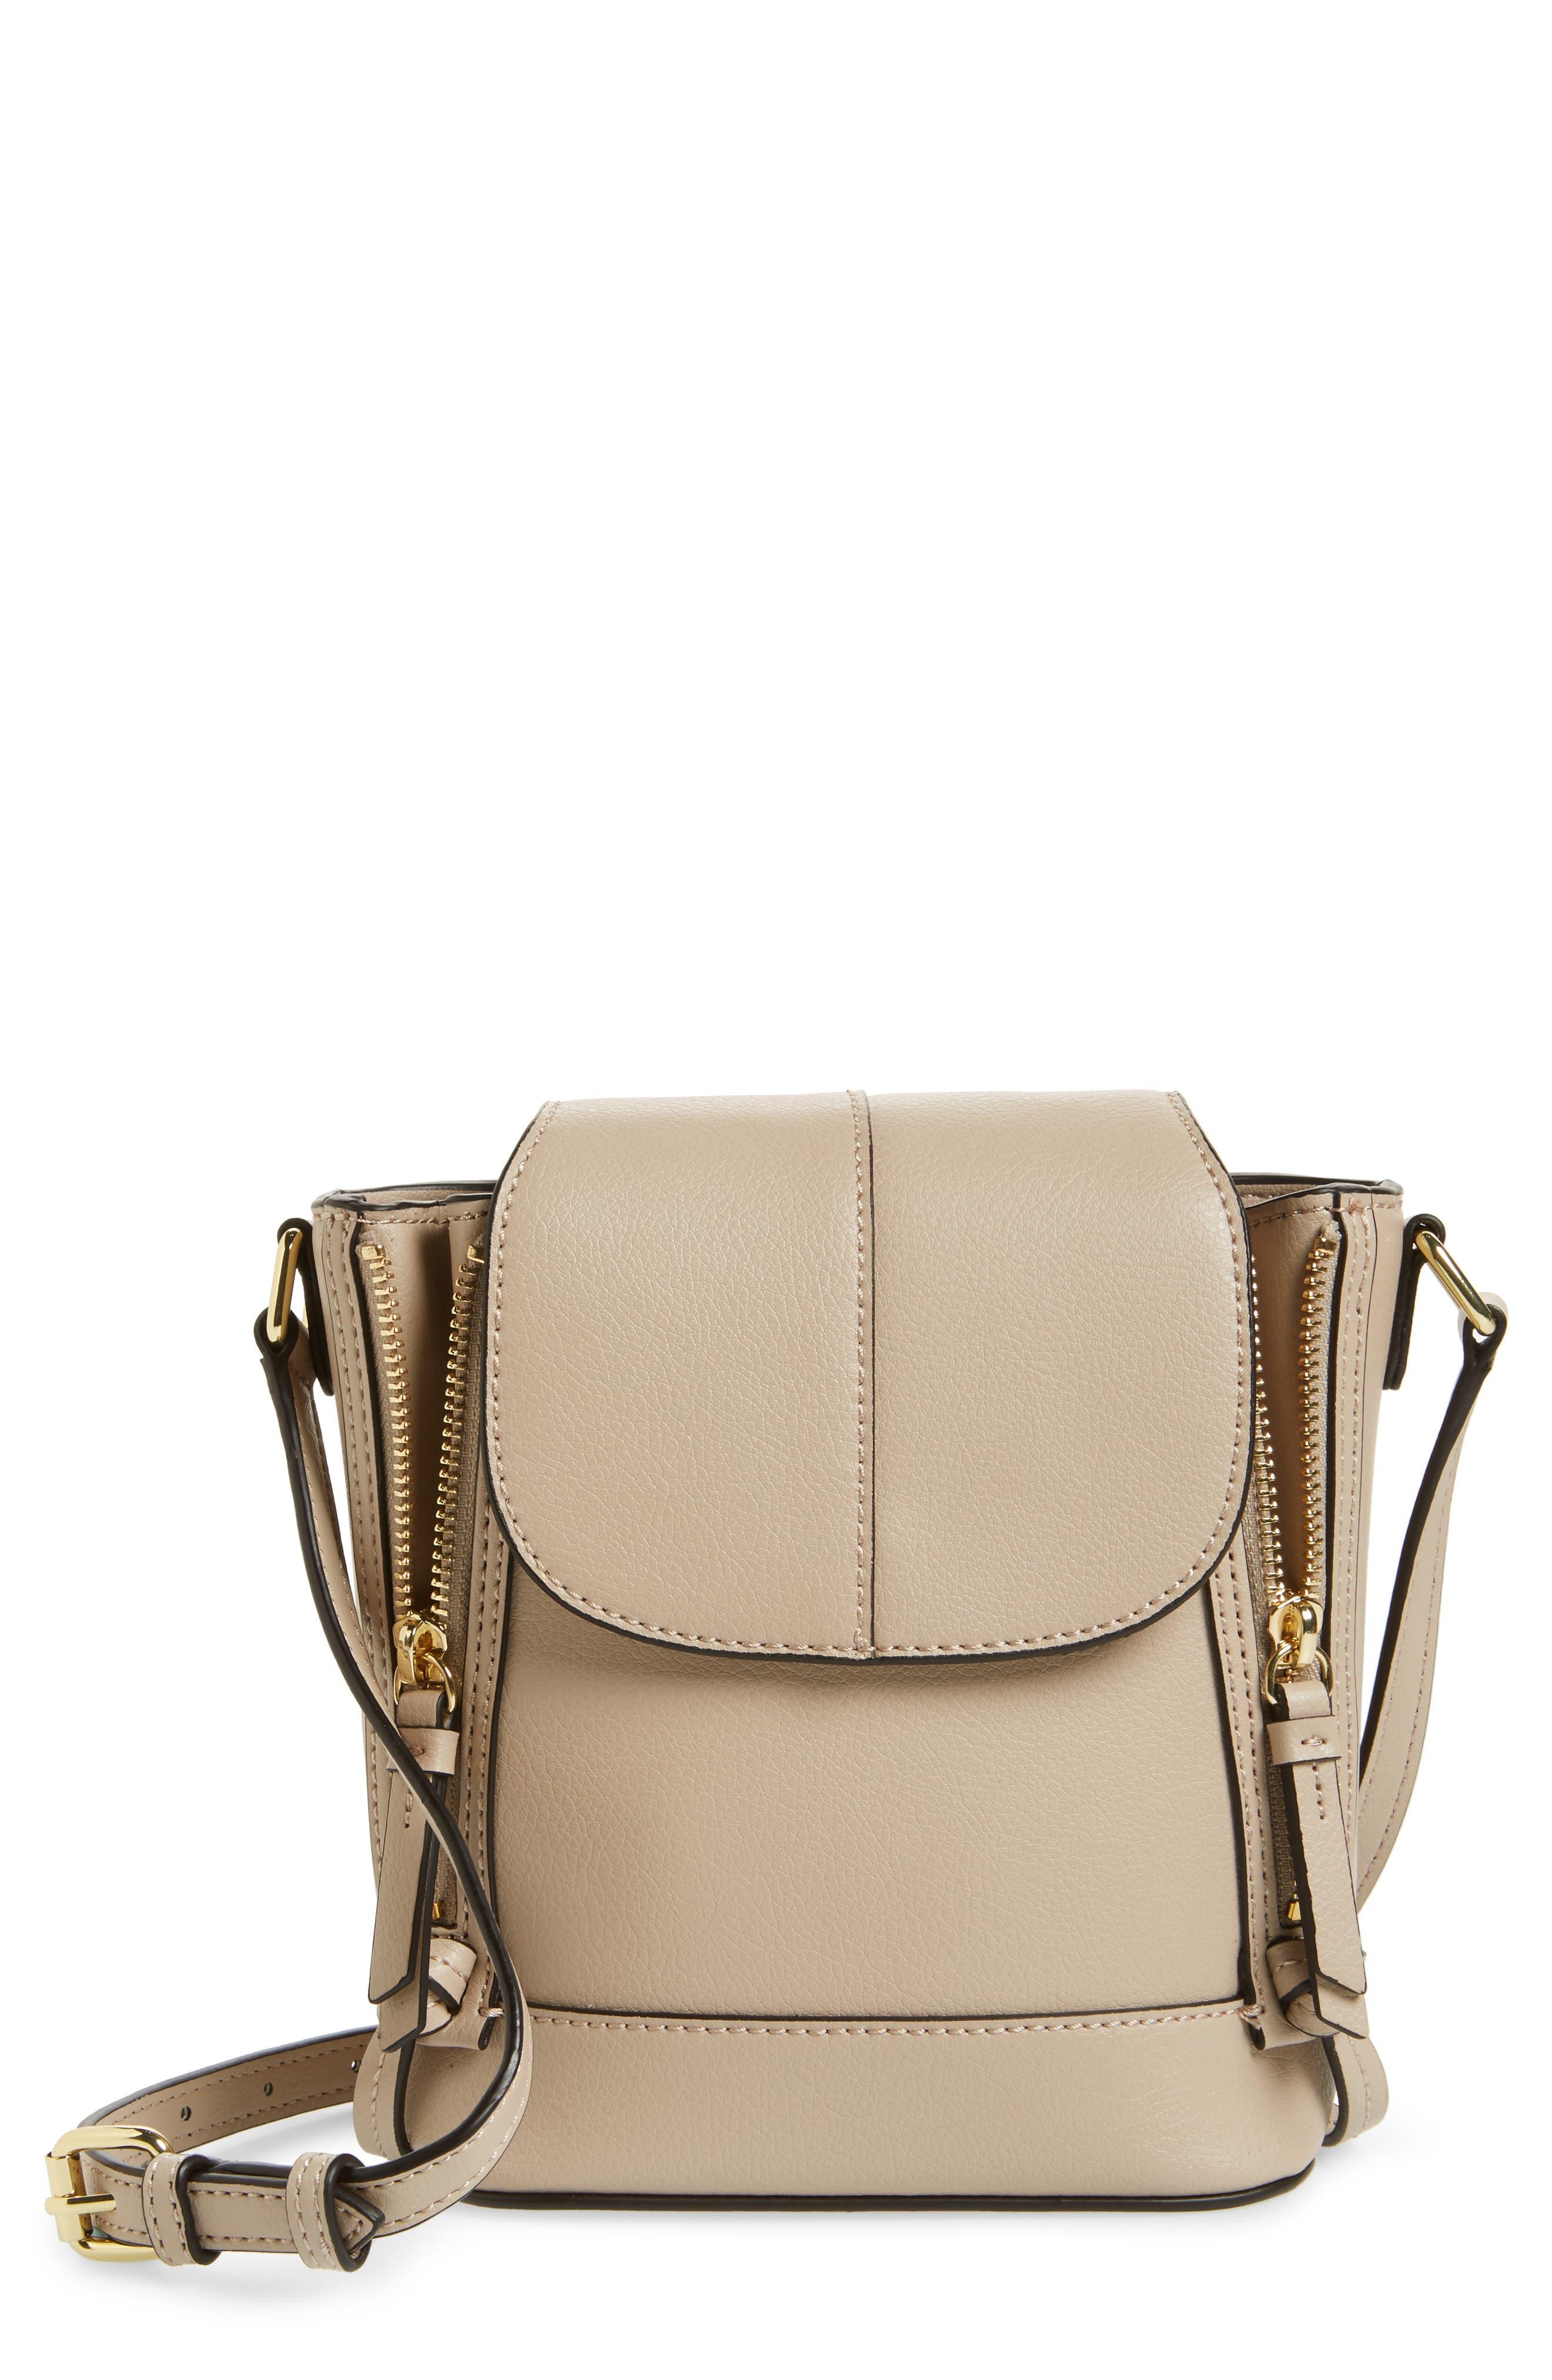 Beckett Leather Crossbody Bag,                             Main thumbnail 1, color,                             250